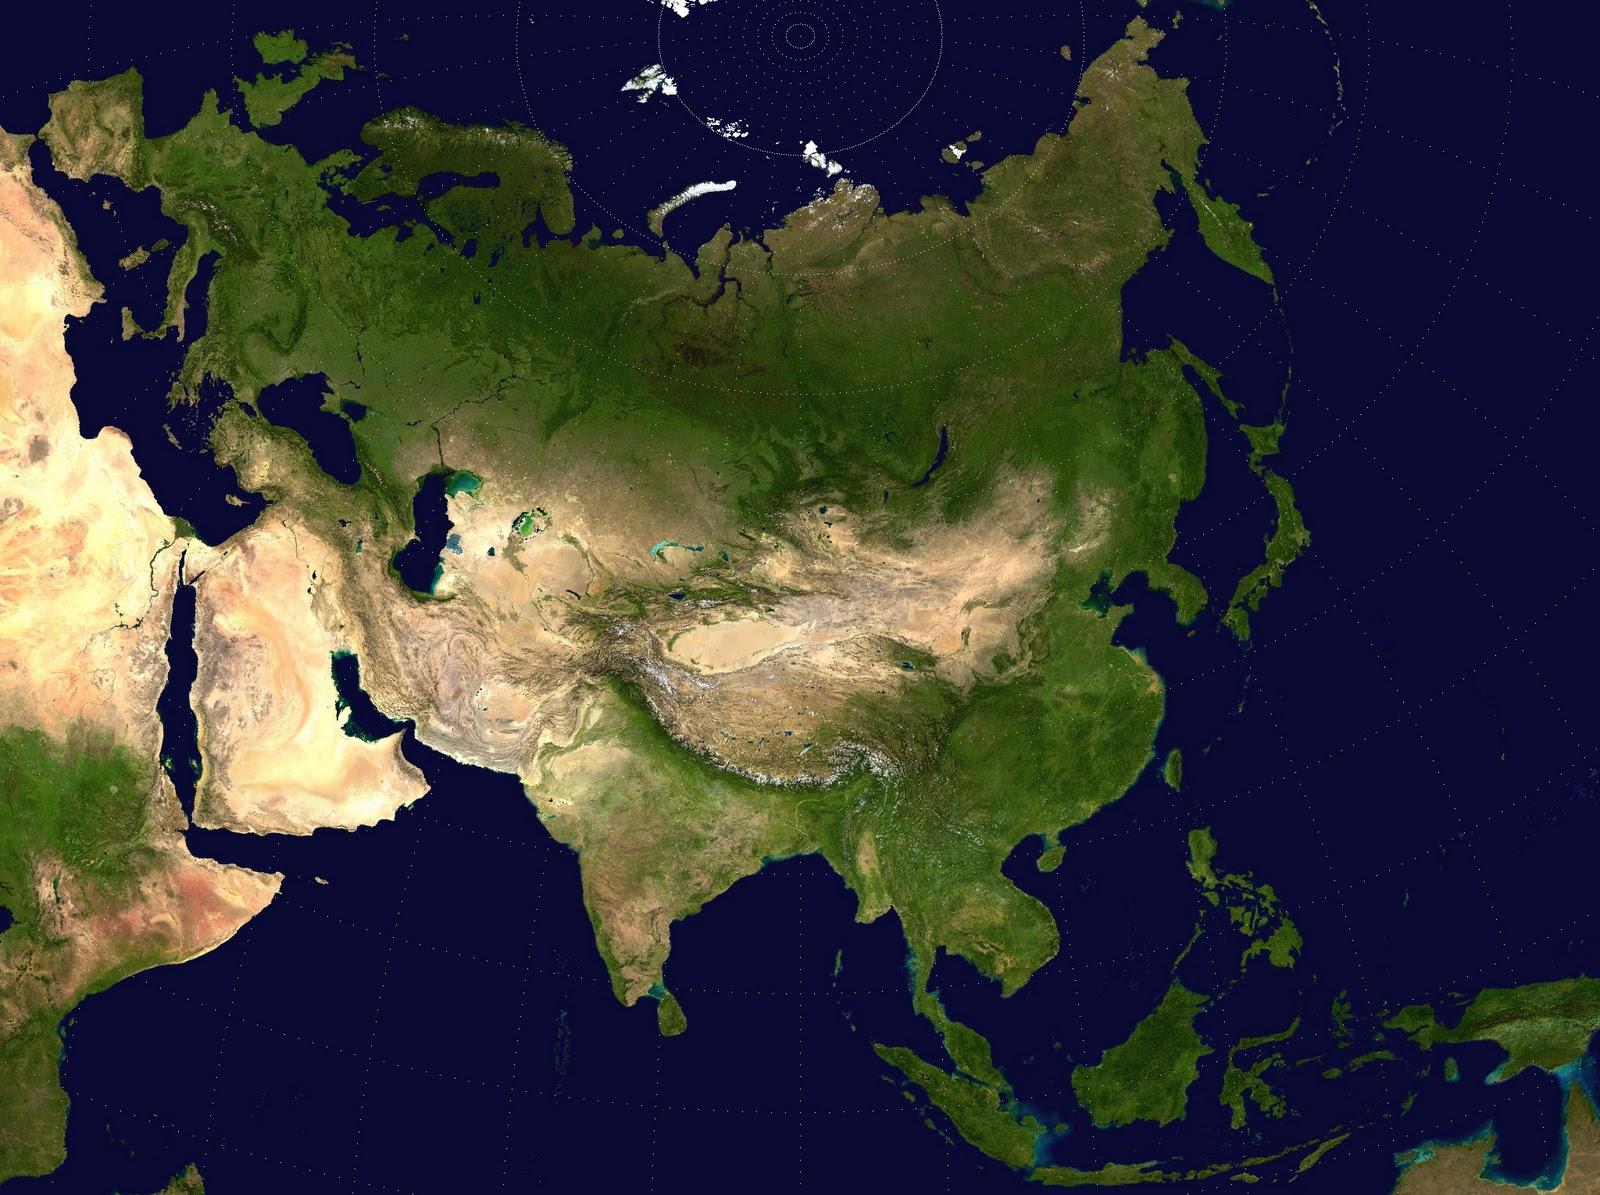 Room 5 World History Geography Of The Arabian Peninsula